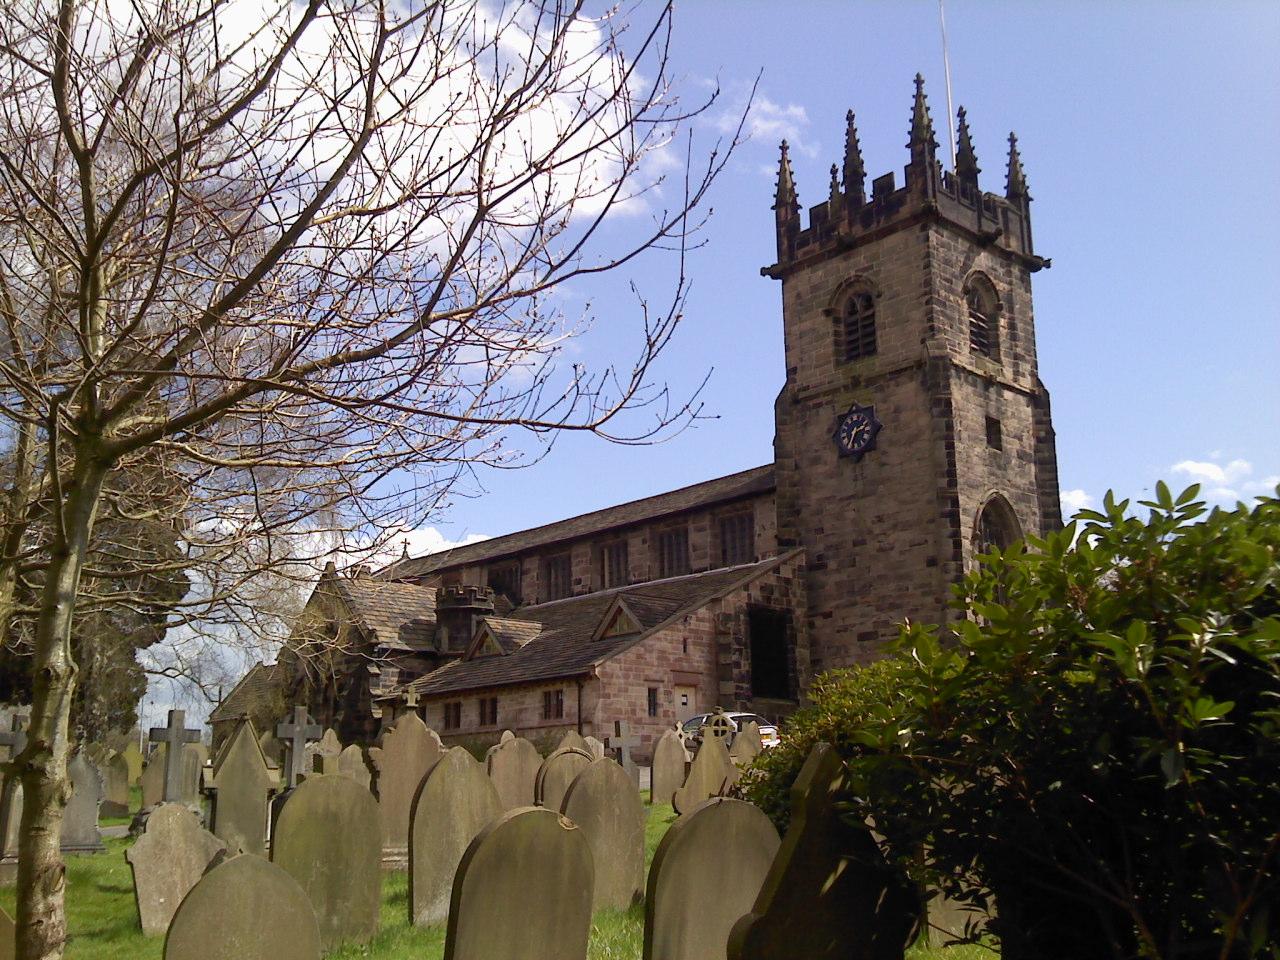 St Bartholomew's Church, Wilmslow, Cheshire